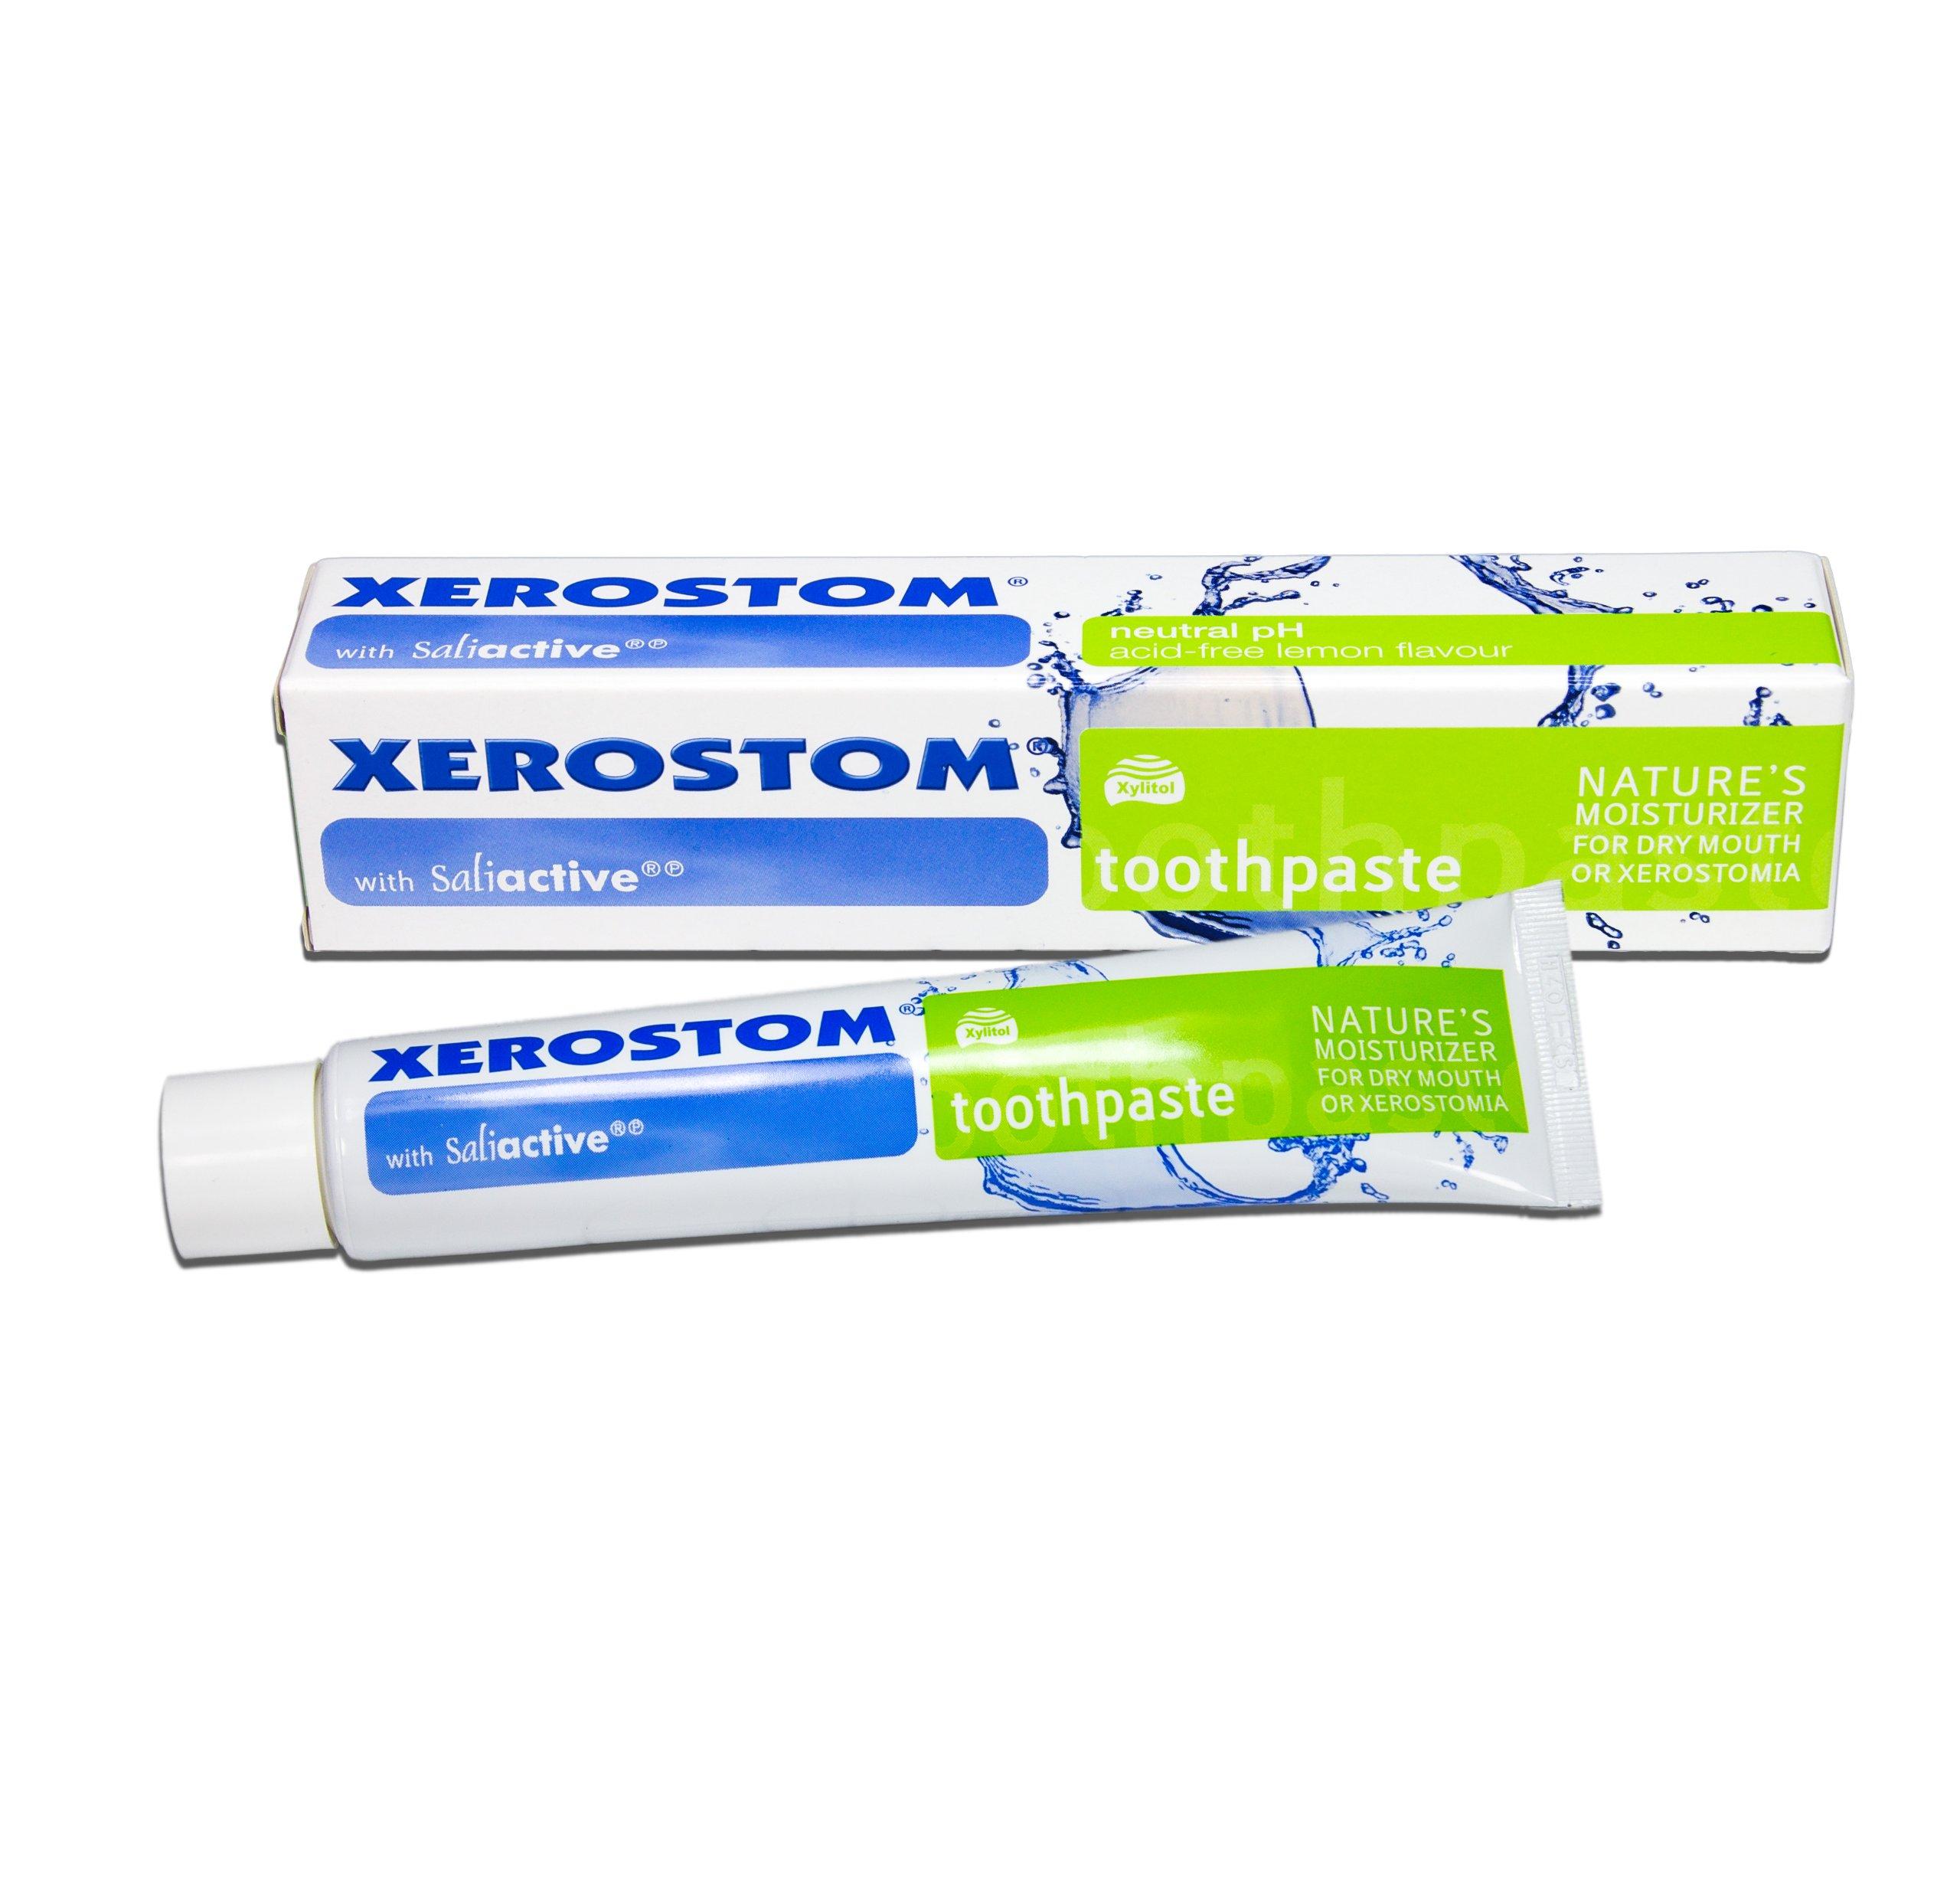 Xerostom With Saliactive For Dry Mouth Or Xerostomia Toothpaste 50ml